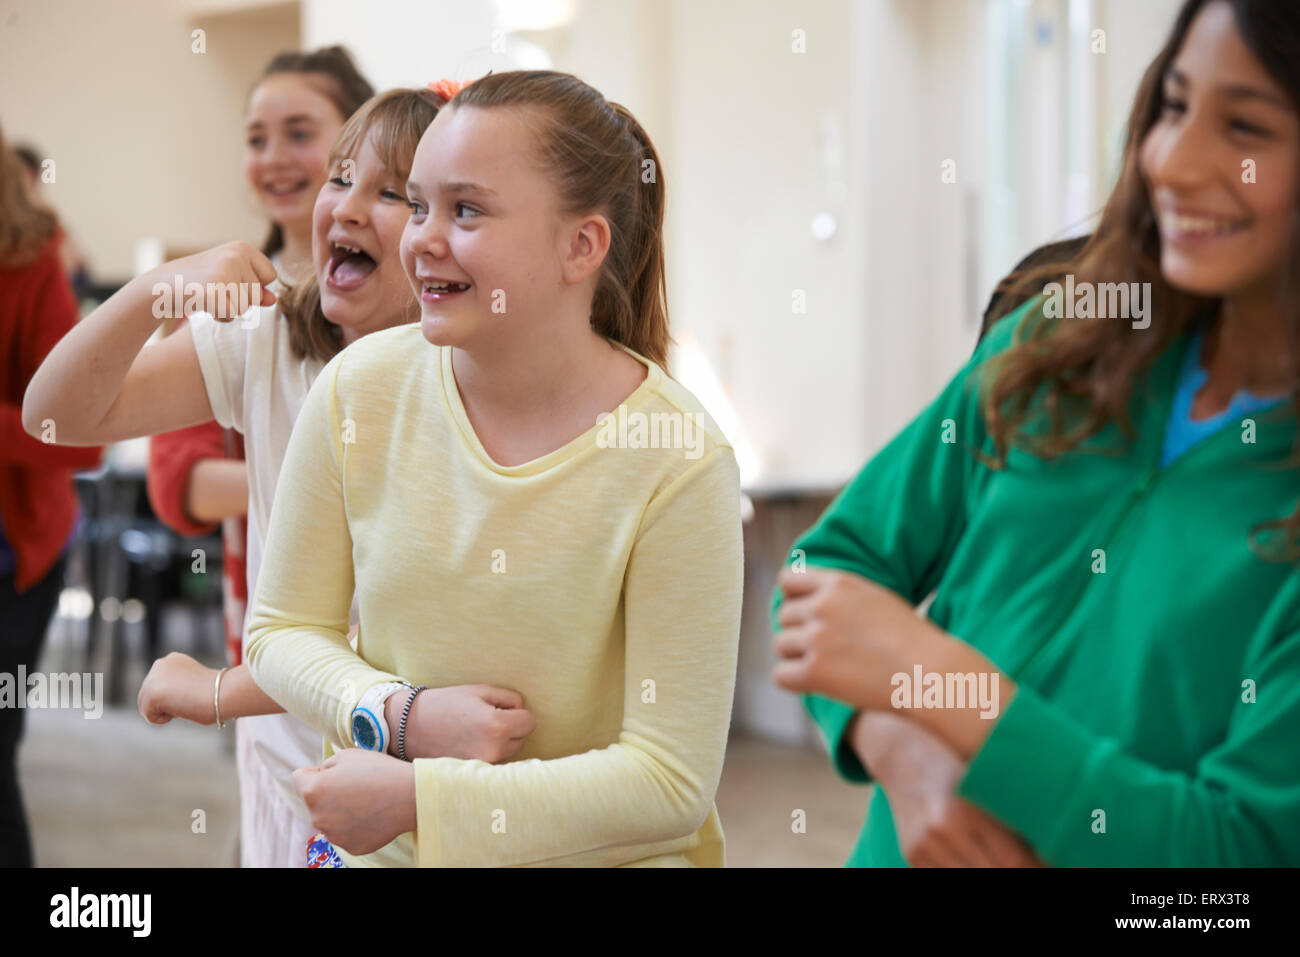 Group Of Children Enjoying Drama Class Together - Stock Image